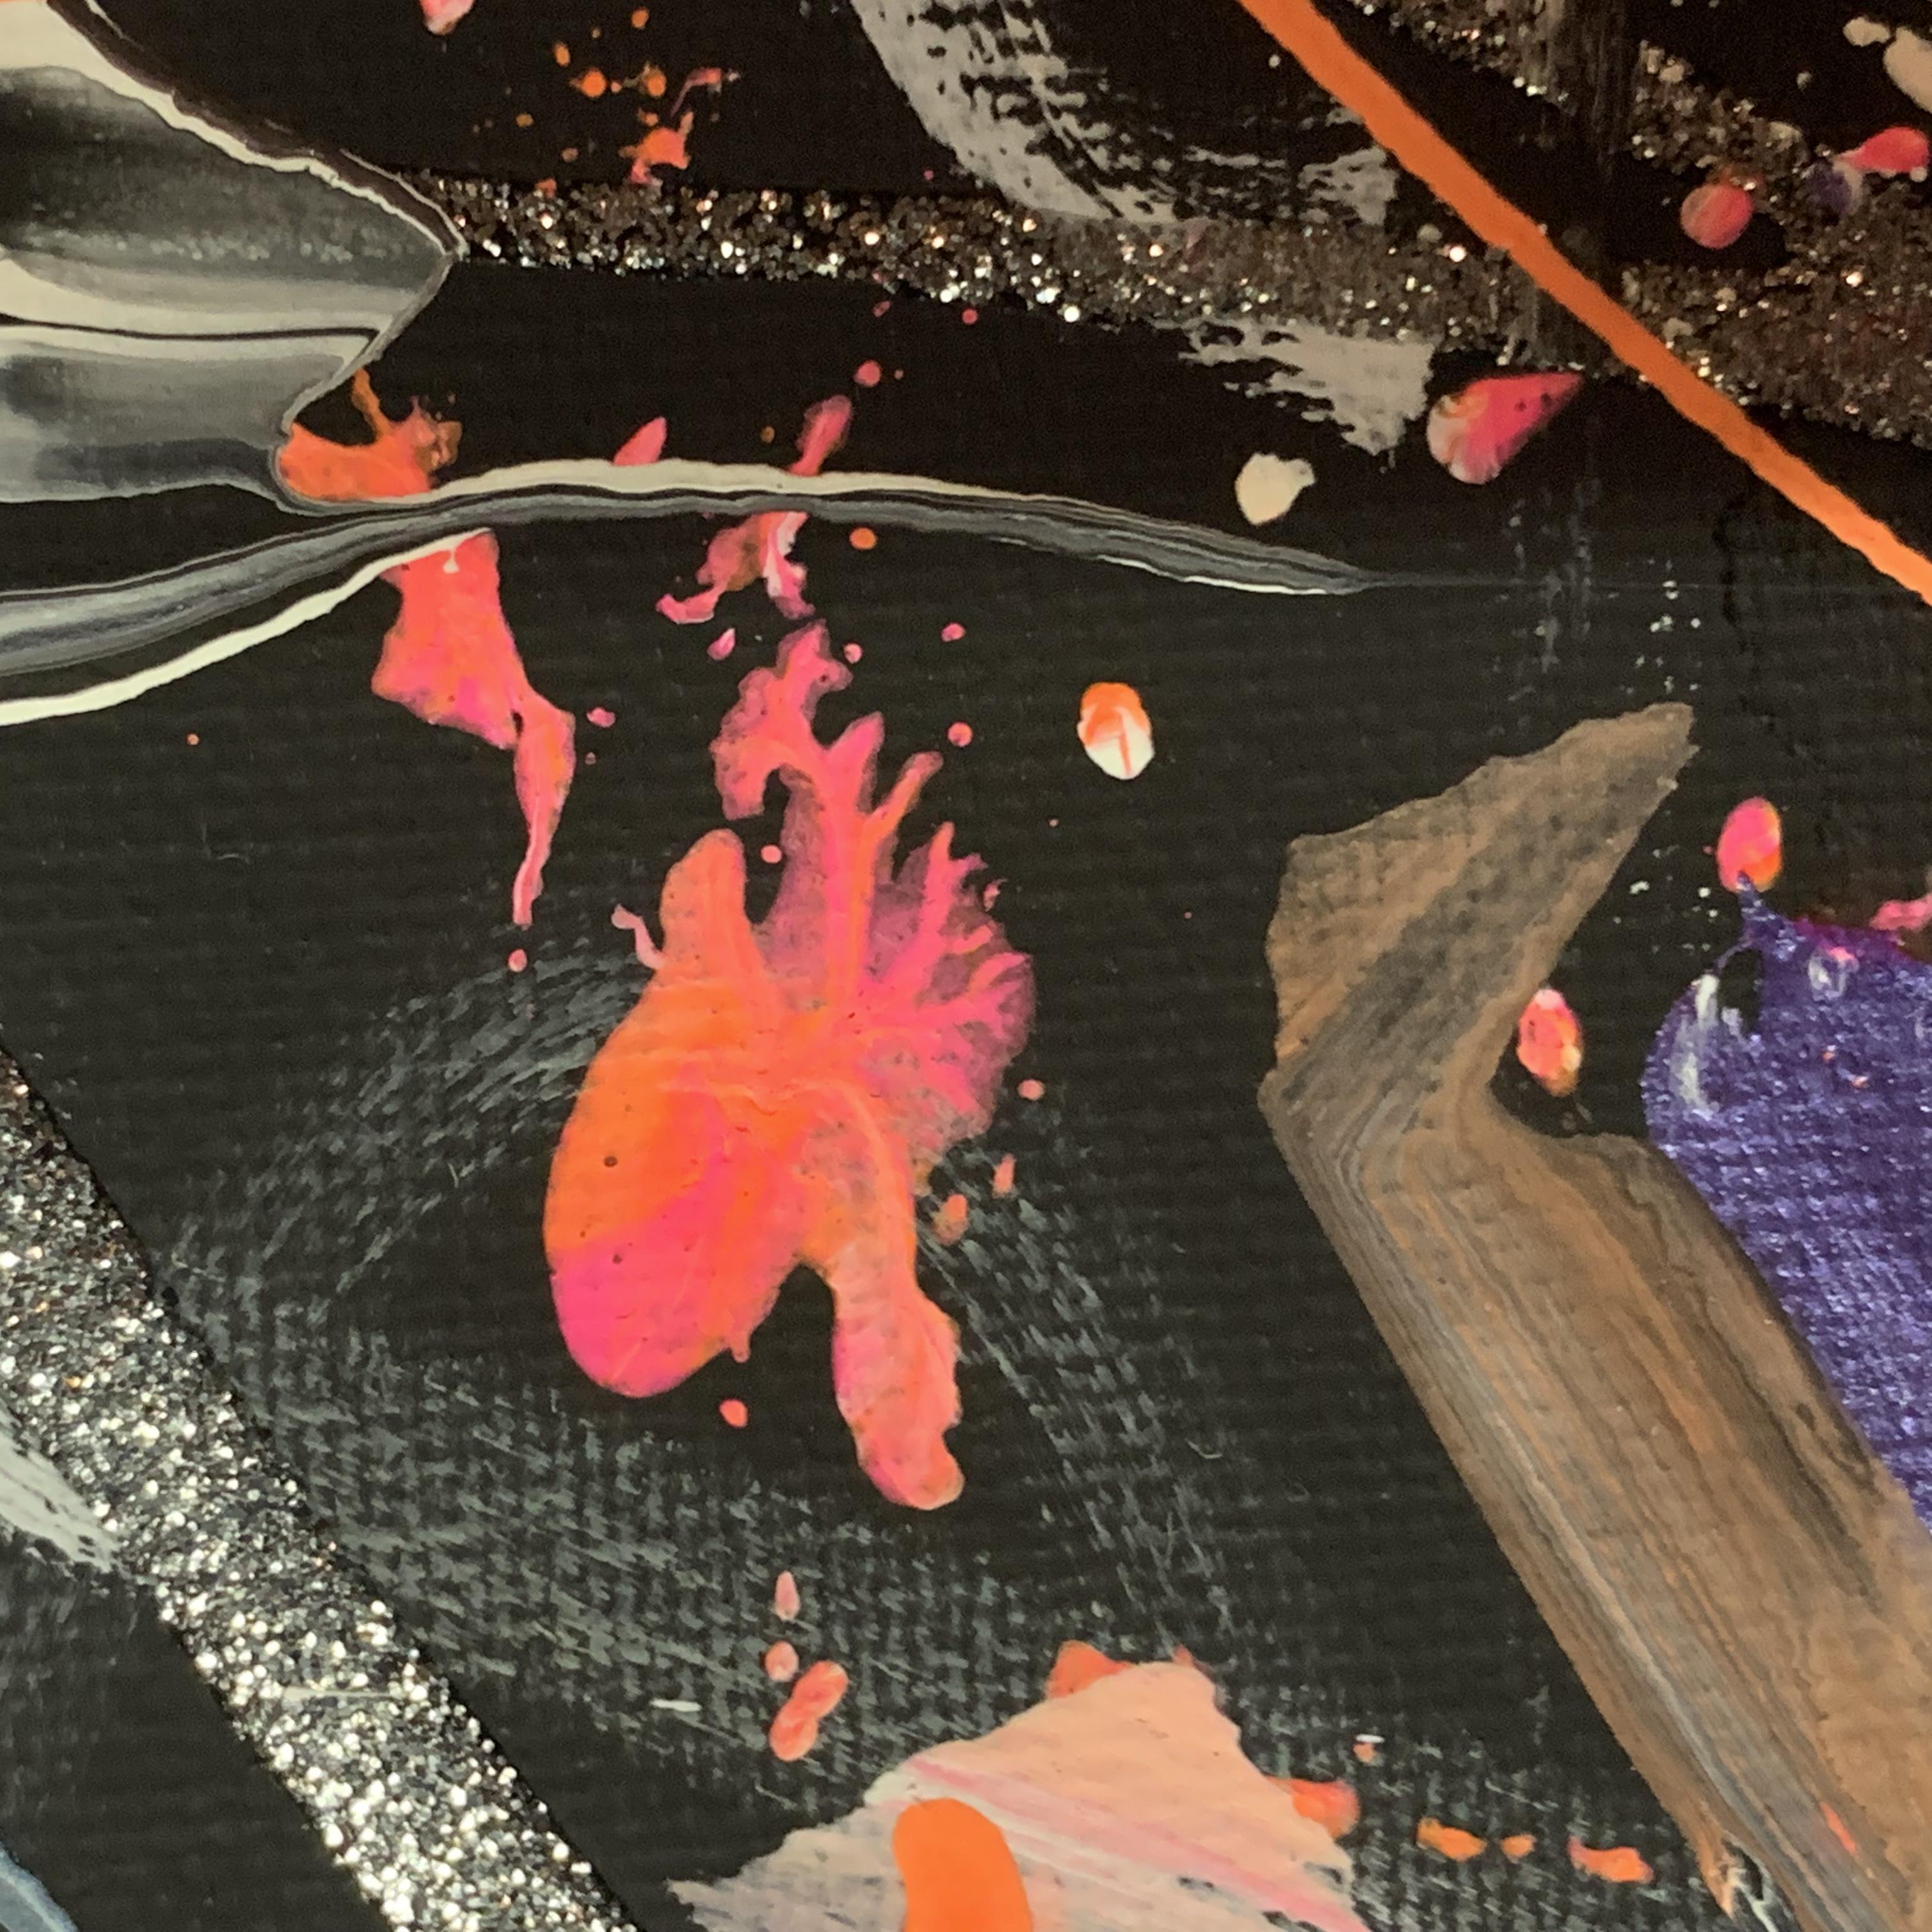 Alu by Francisco Gutiérrez | ArtworkNetwork.com